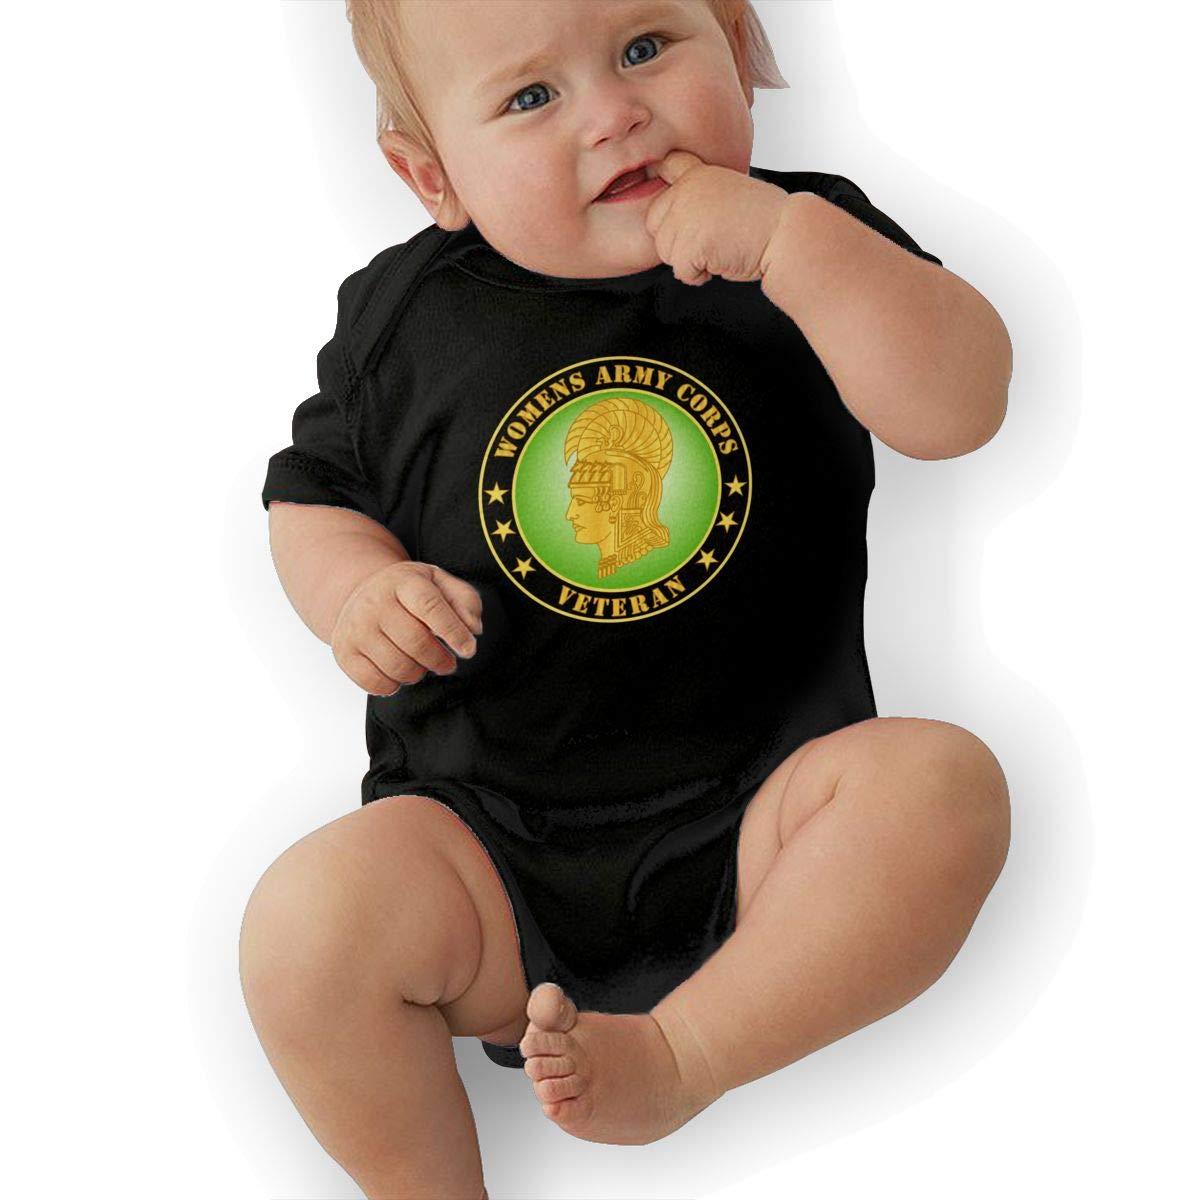 Manlee Army Corps Veteran Newborn Infant Toddler Baby Girls Boys Bodysuit Short Sleeve 0-24 MonthsBlack